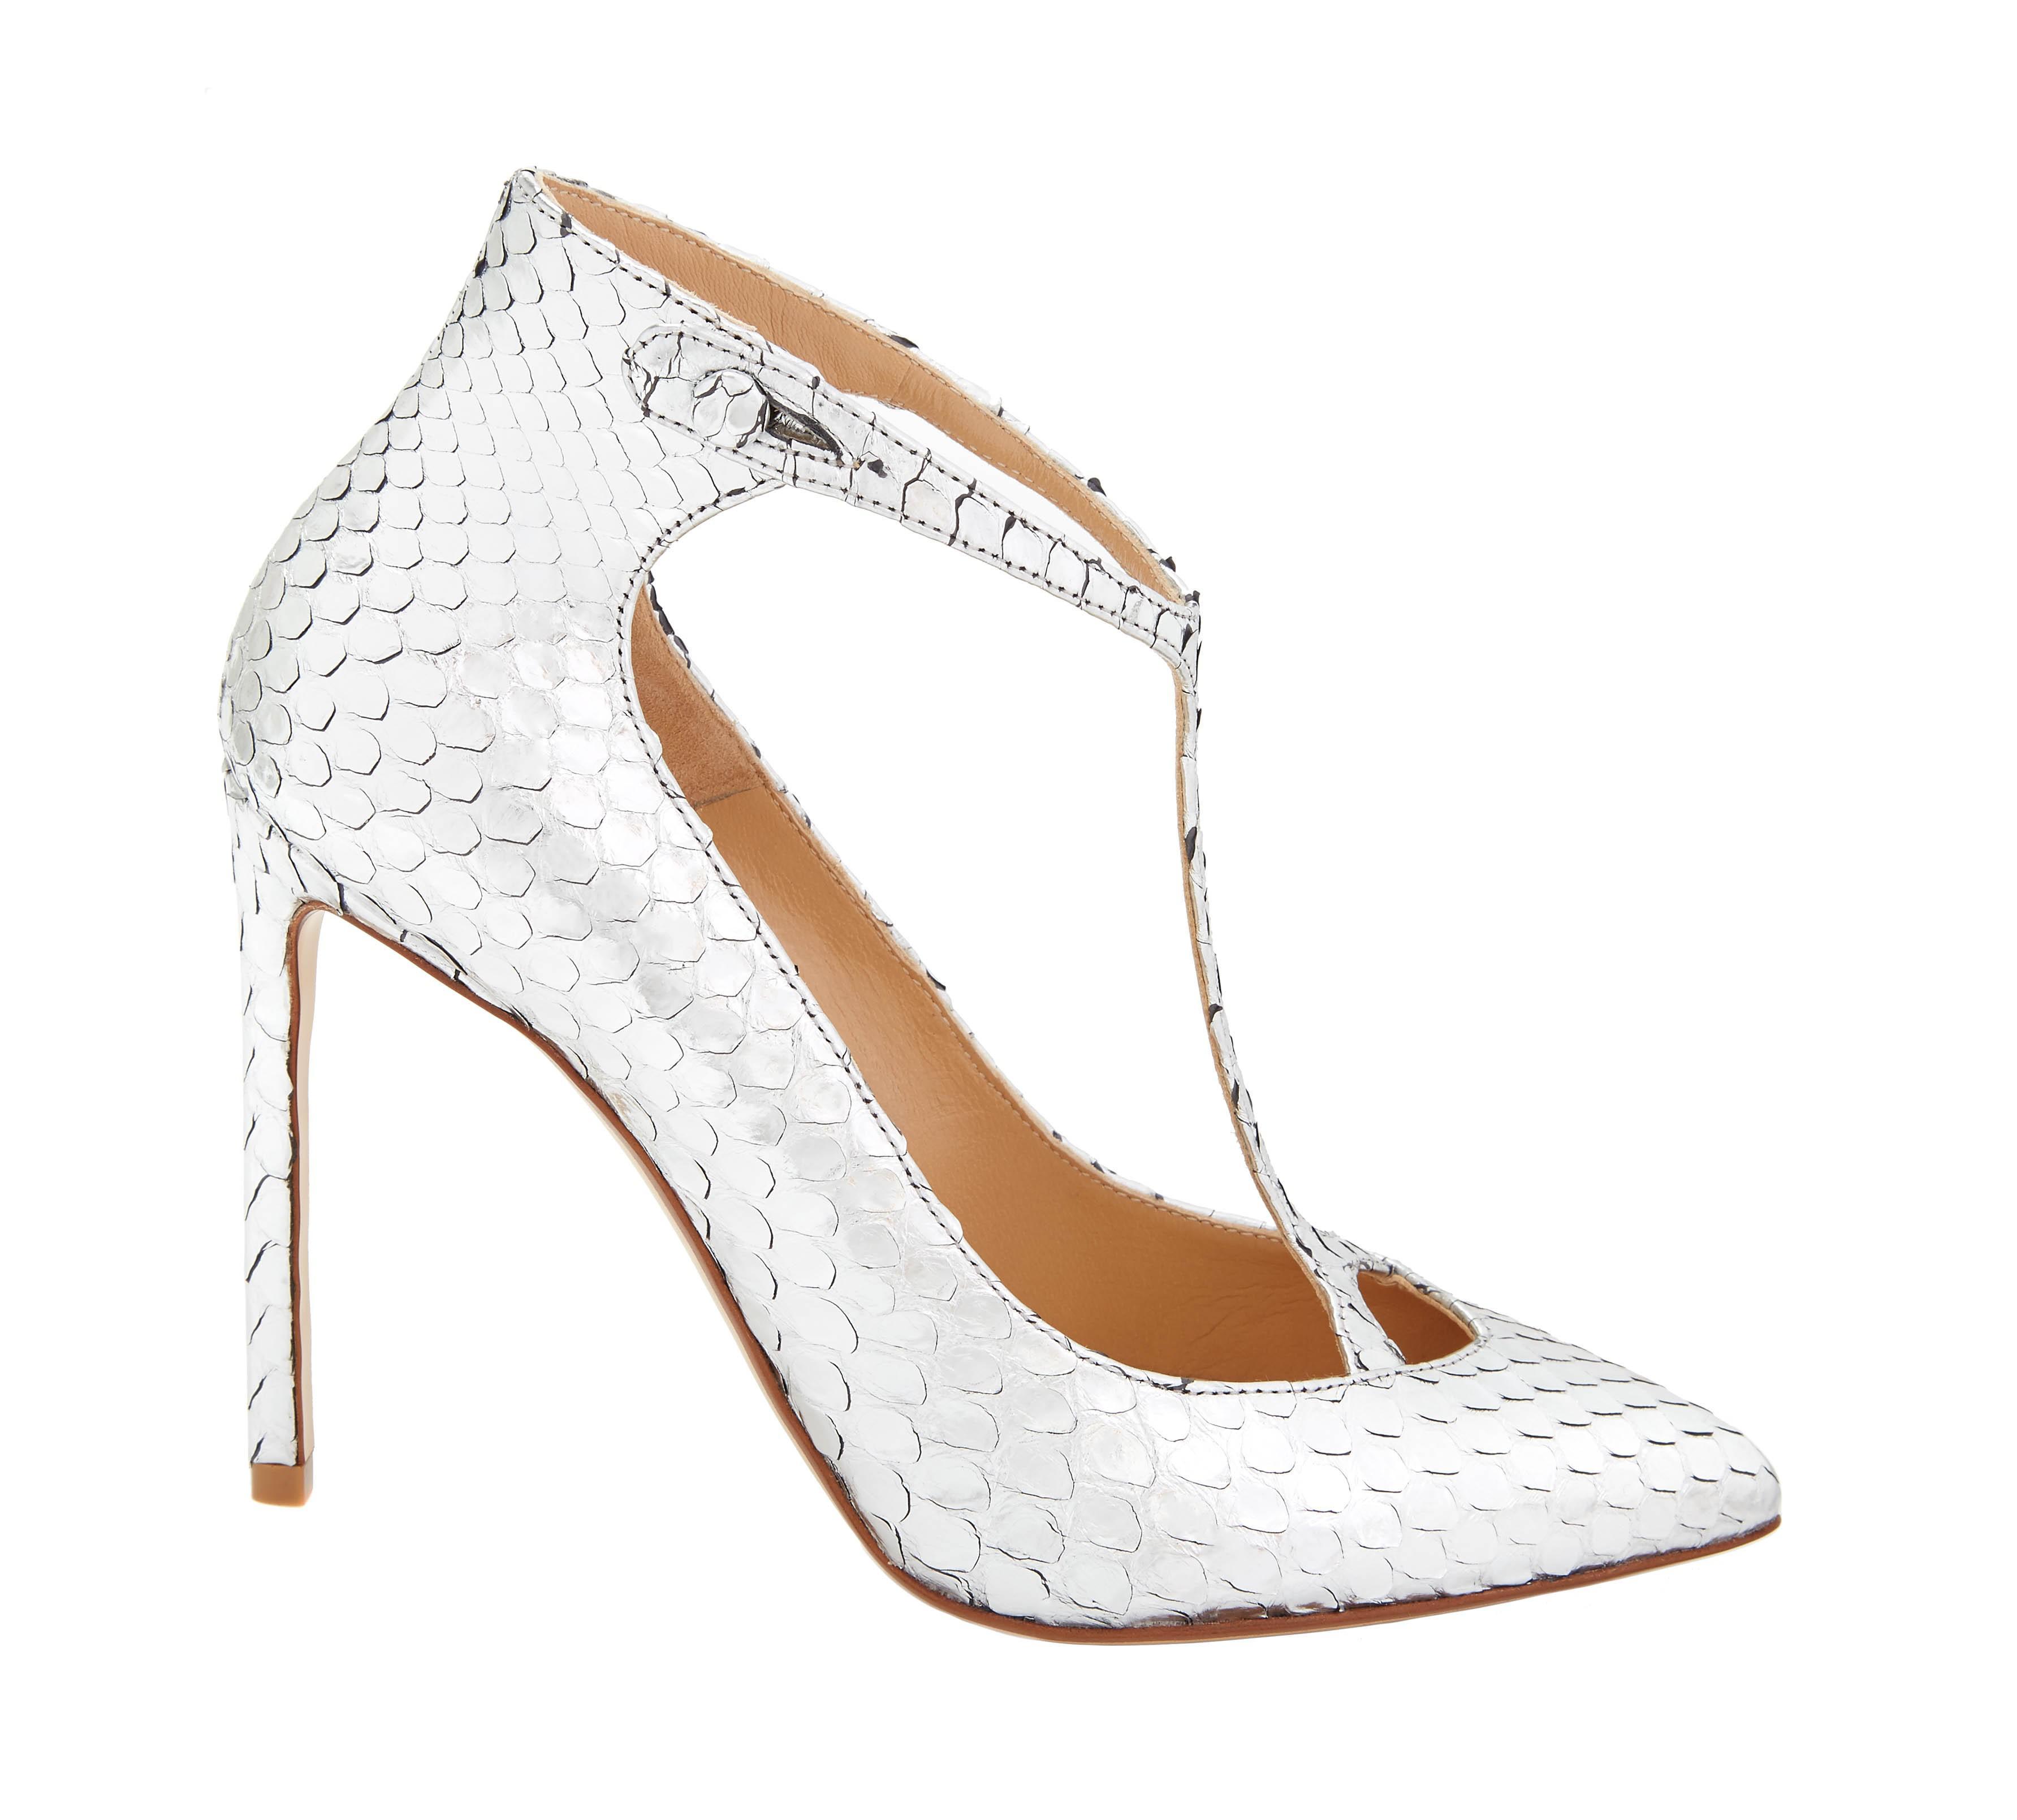 16c0c8bb0c5 Lyst - Francesco Russo Anaconda Skin Silver T Bar Heels in Metallic